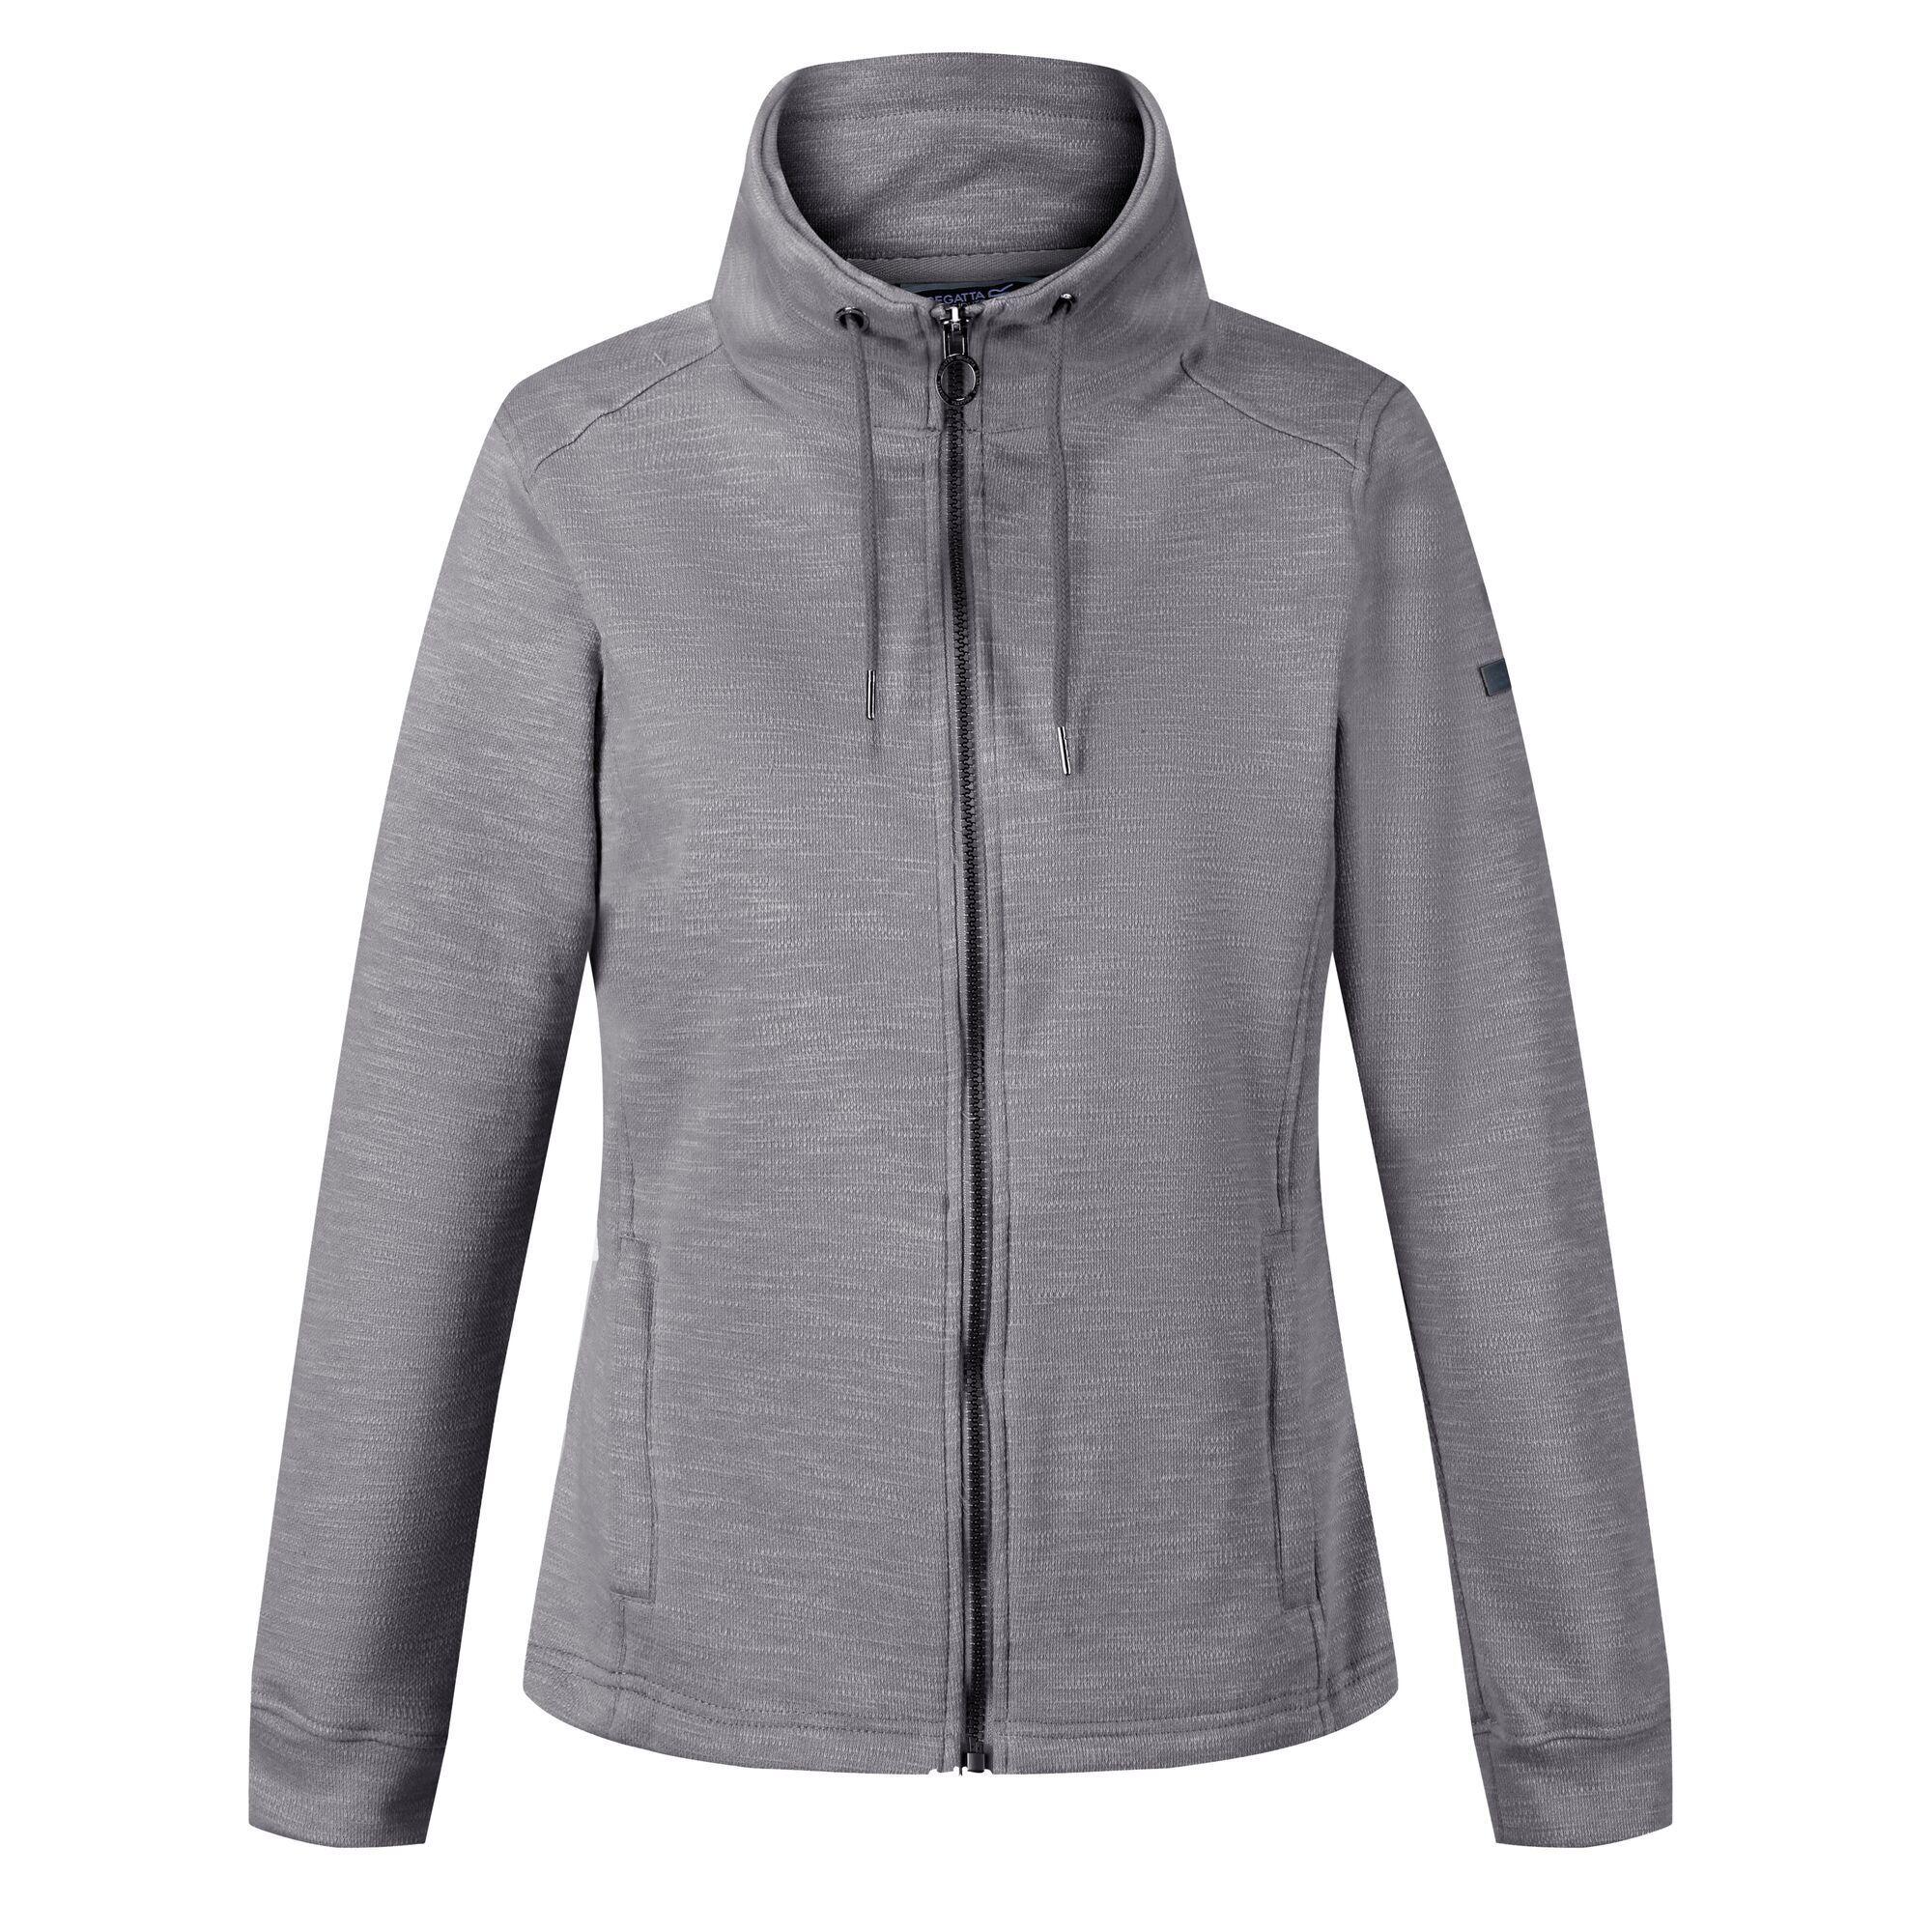 Regatta Womens/Ladies Olena Snood Collar Fleece Jacket (14 UK) (Rock Grey)